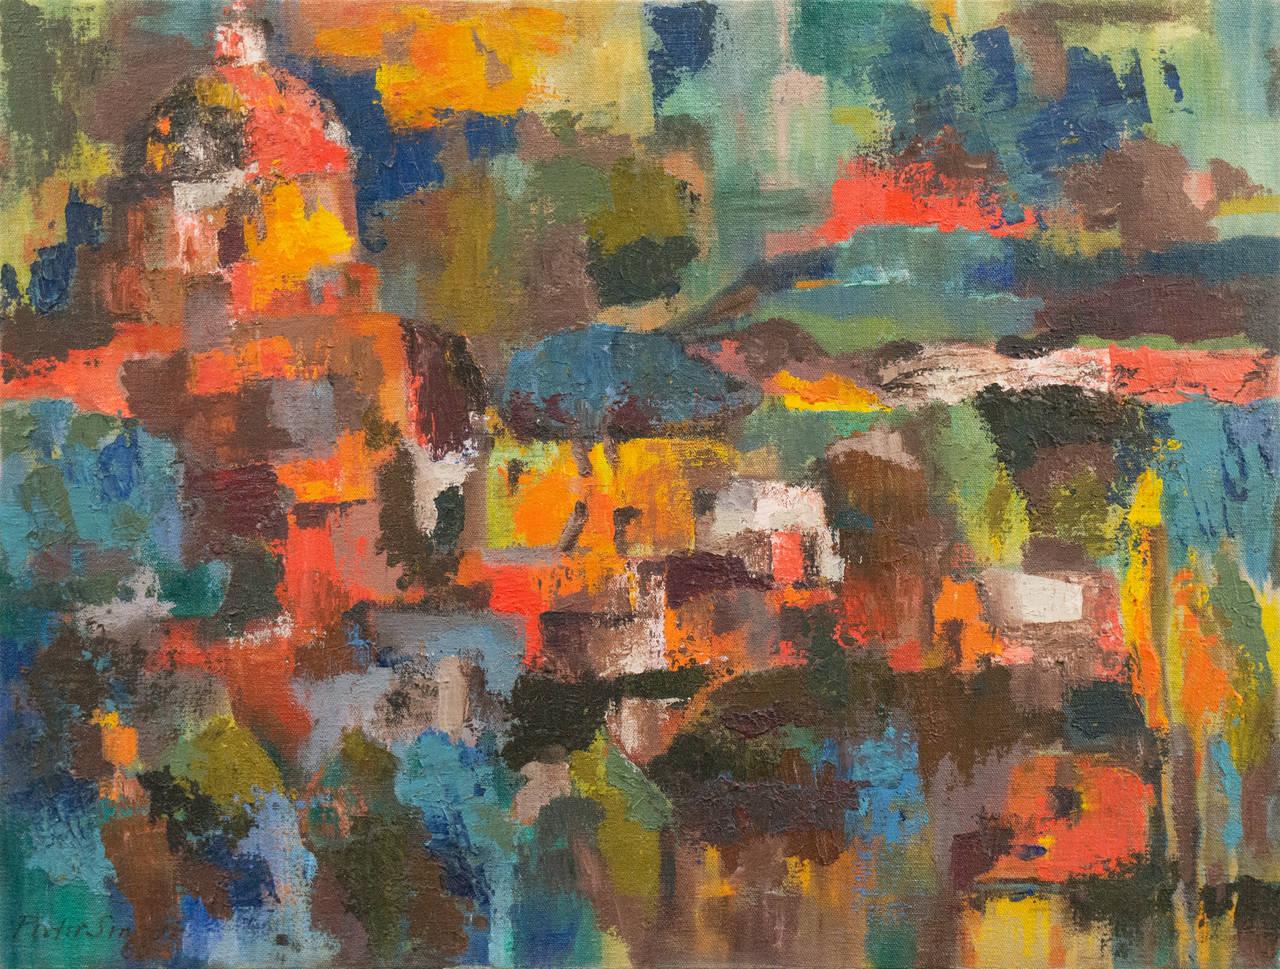 'Iglesia San Antonio', Bay Area Abstraction, Mendocino Art Center, San Diego